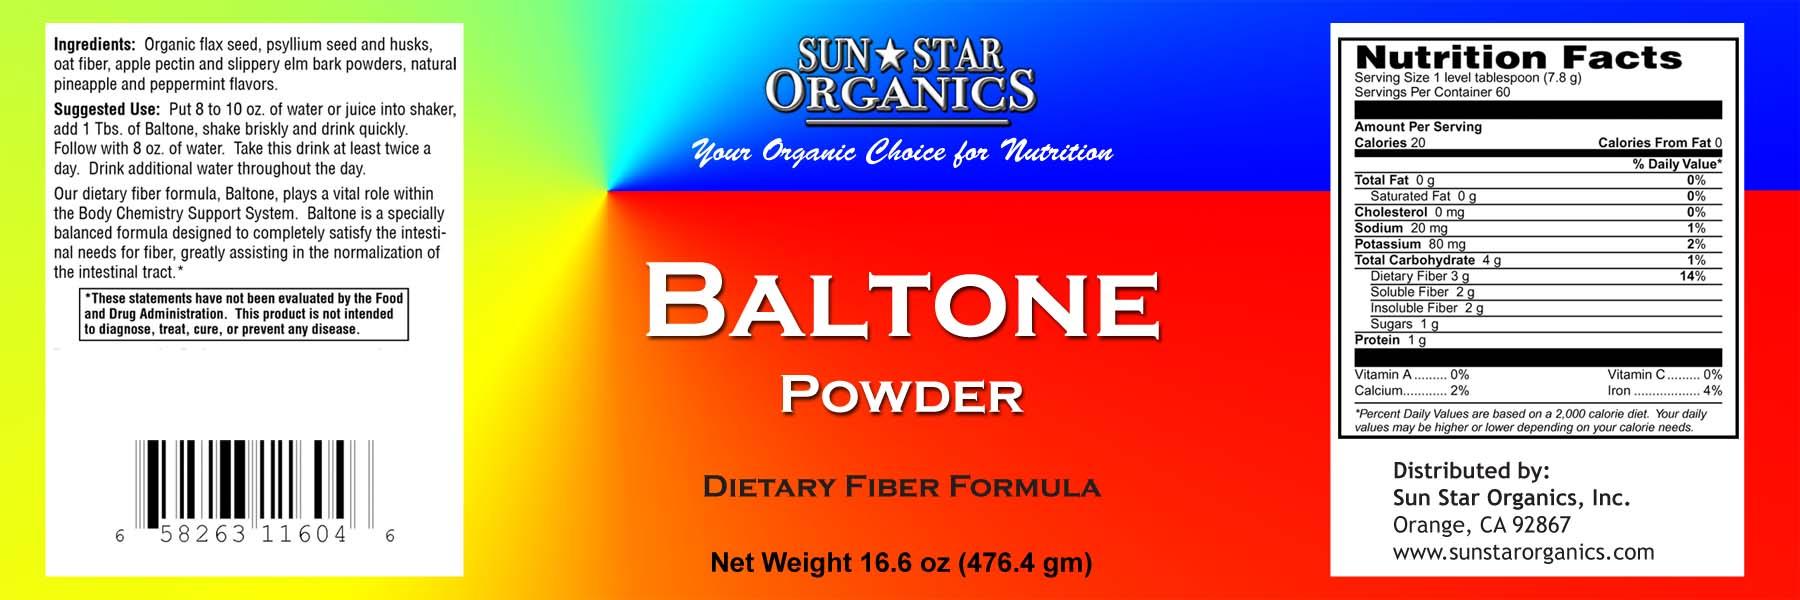 Baltone Powder